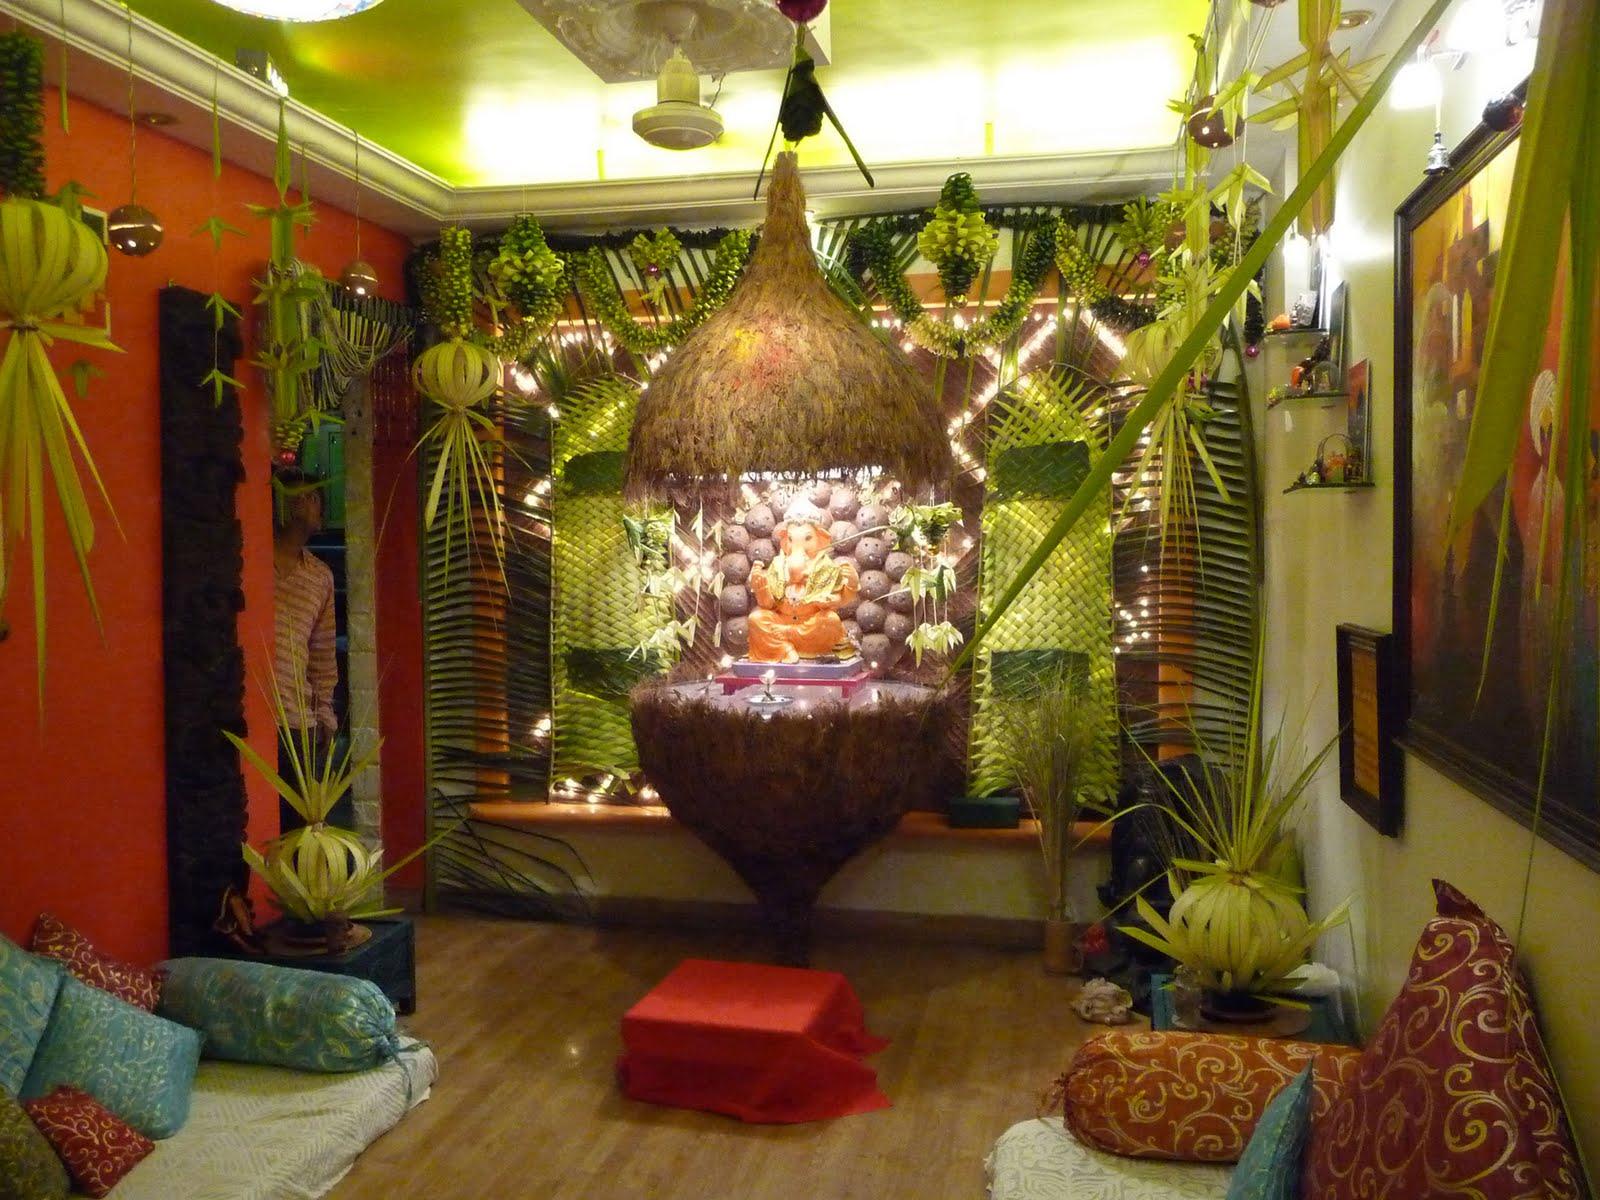 Simple wedding stage decoration at home  Jitesh Mamania jiteshmamania on Pinterest